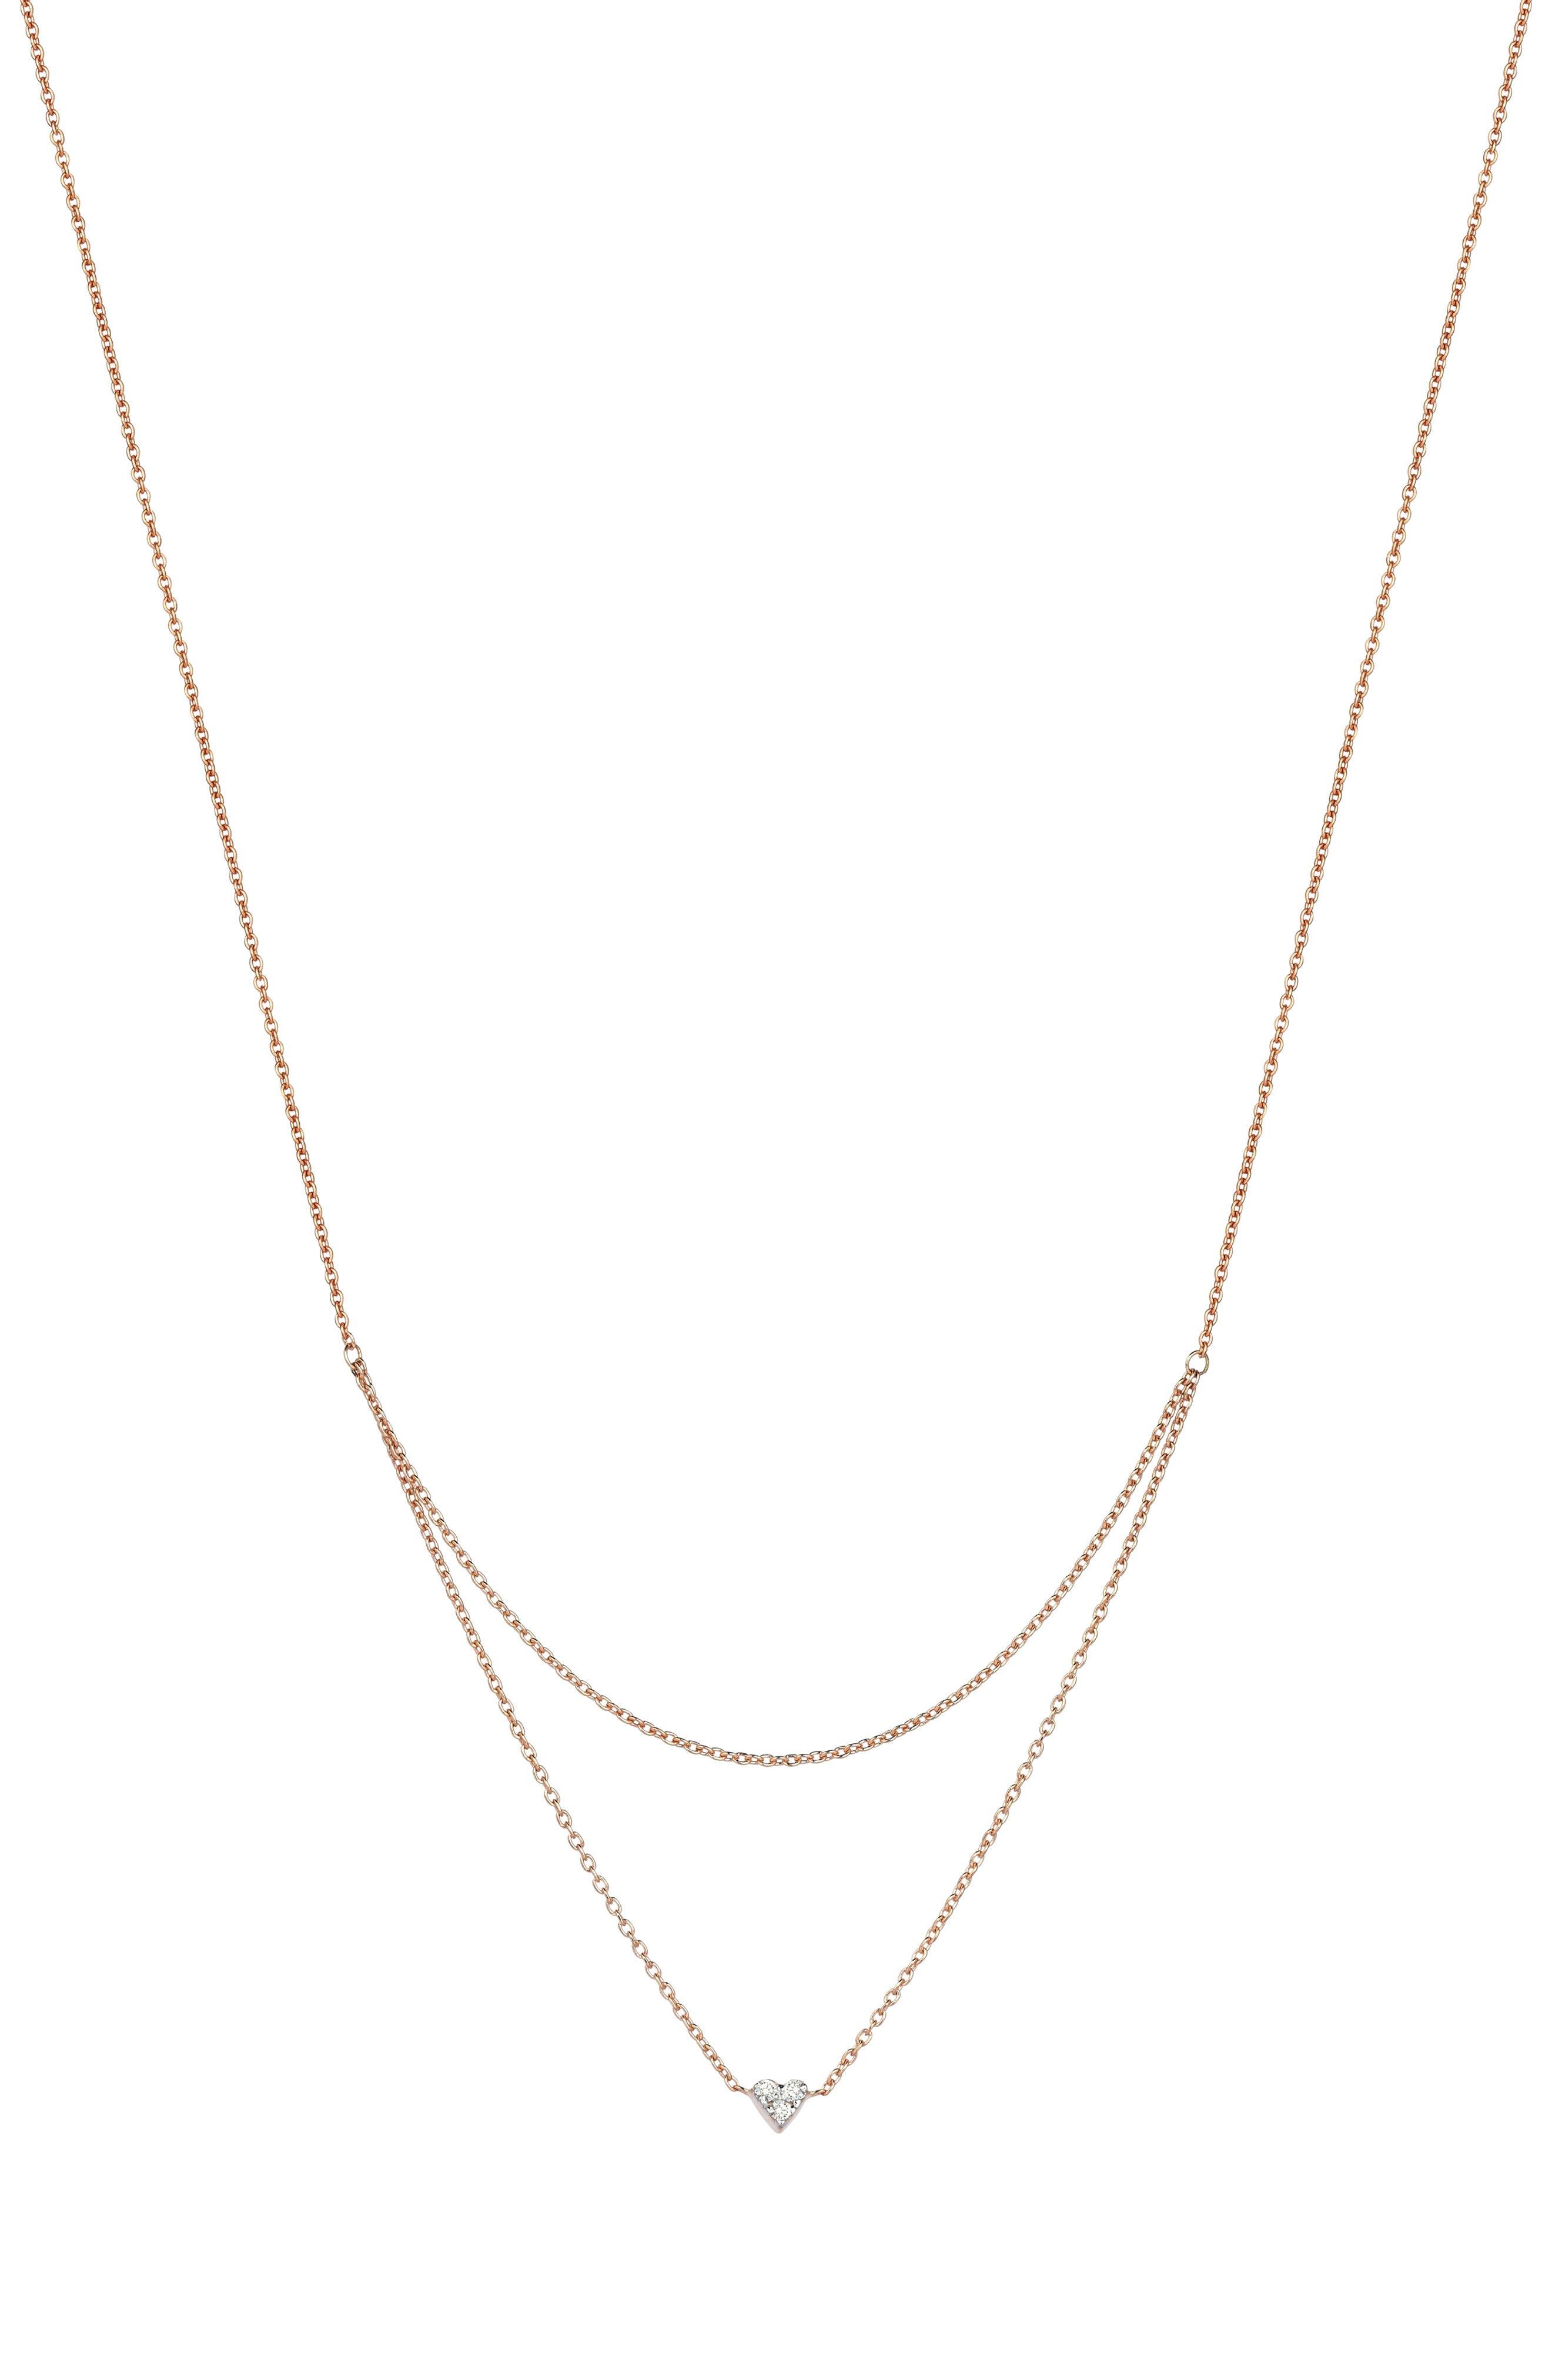 Double Layer Diamond Pendant Necklace,                         Main,                         color, ROSE GOLD